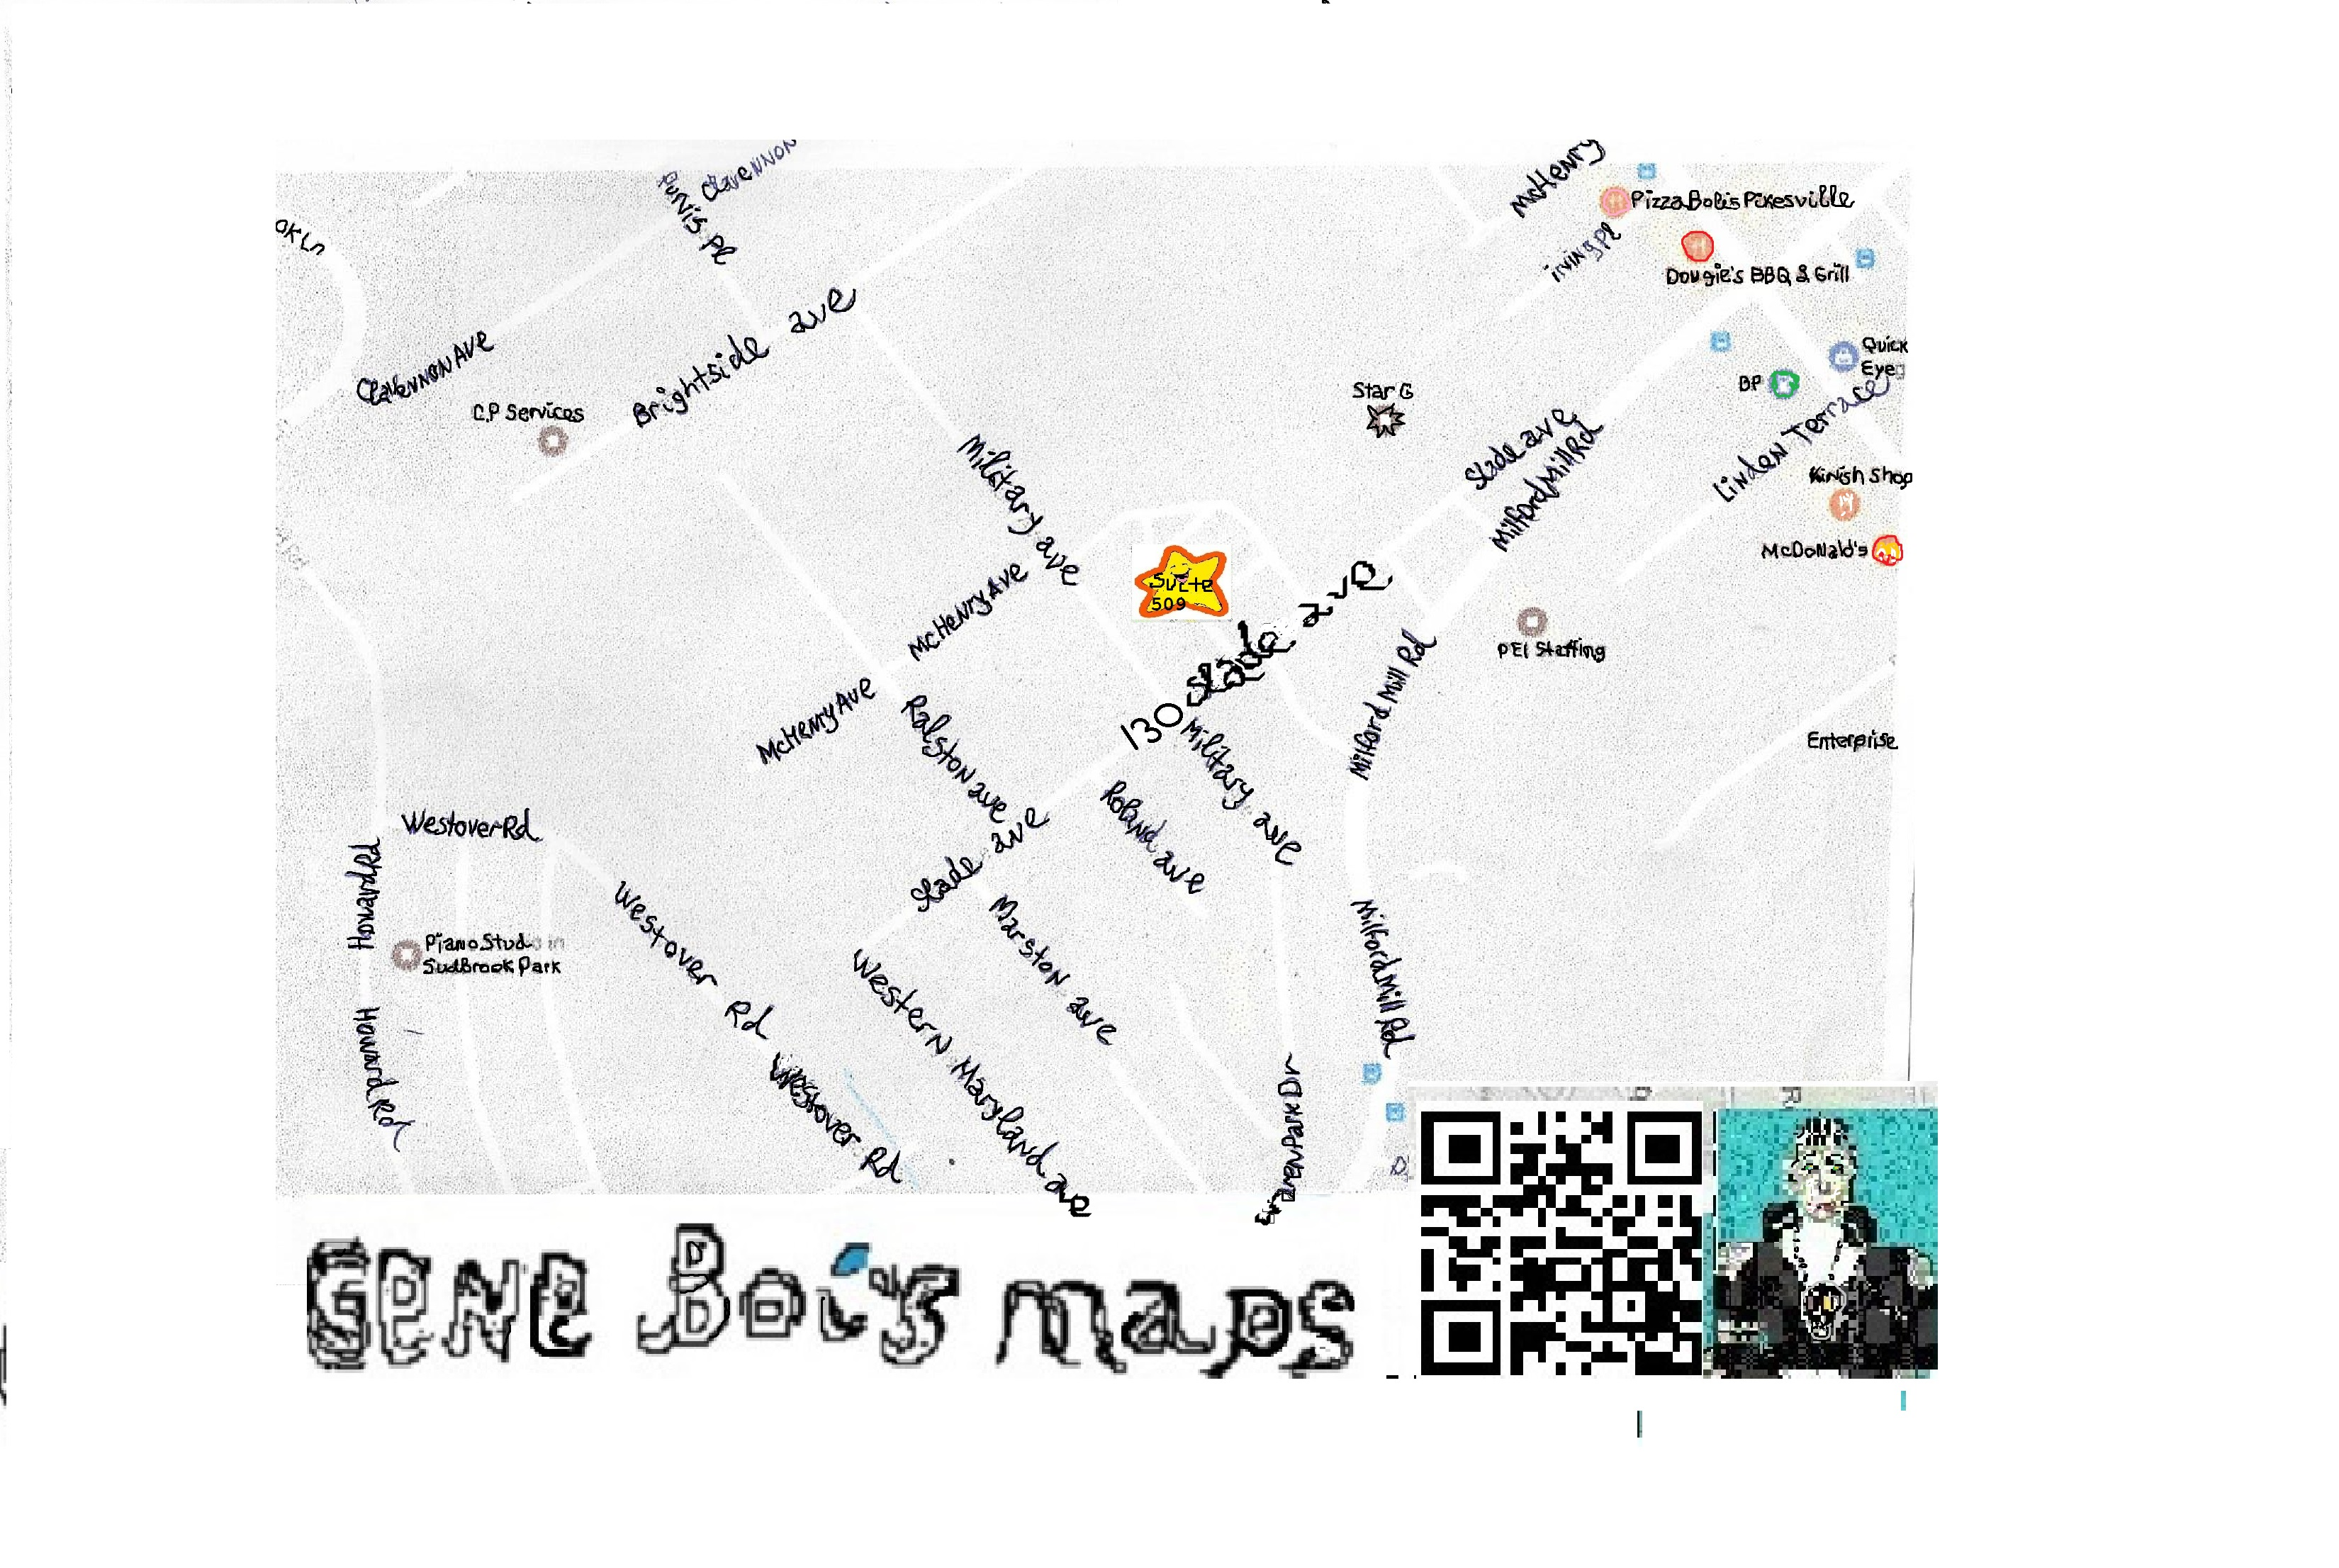 Gene Boi's map